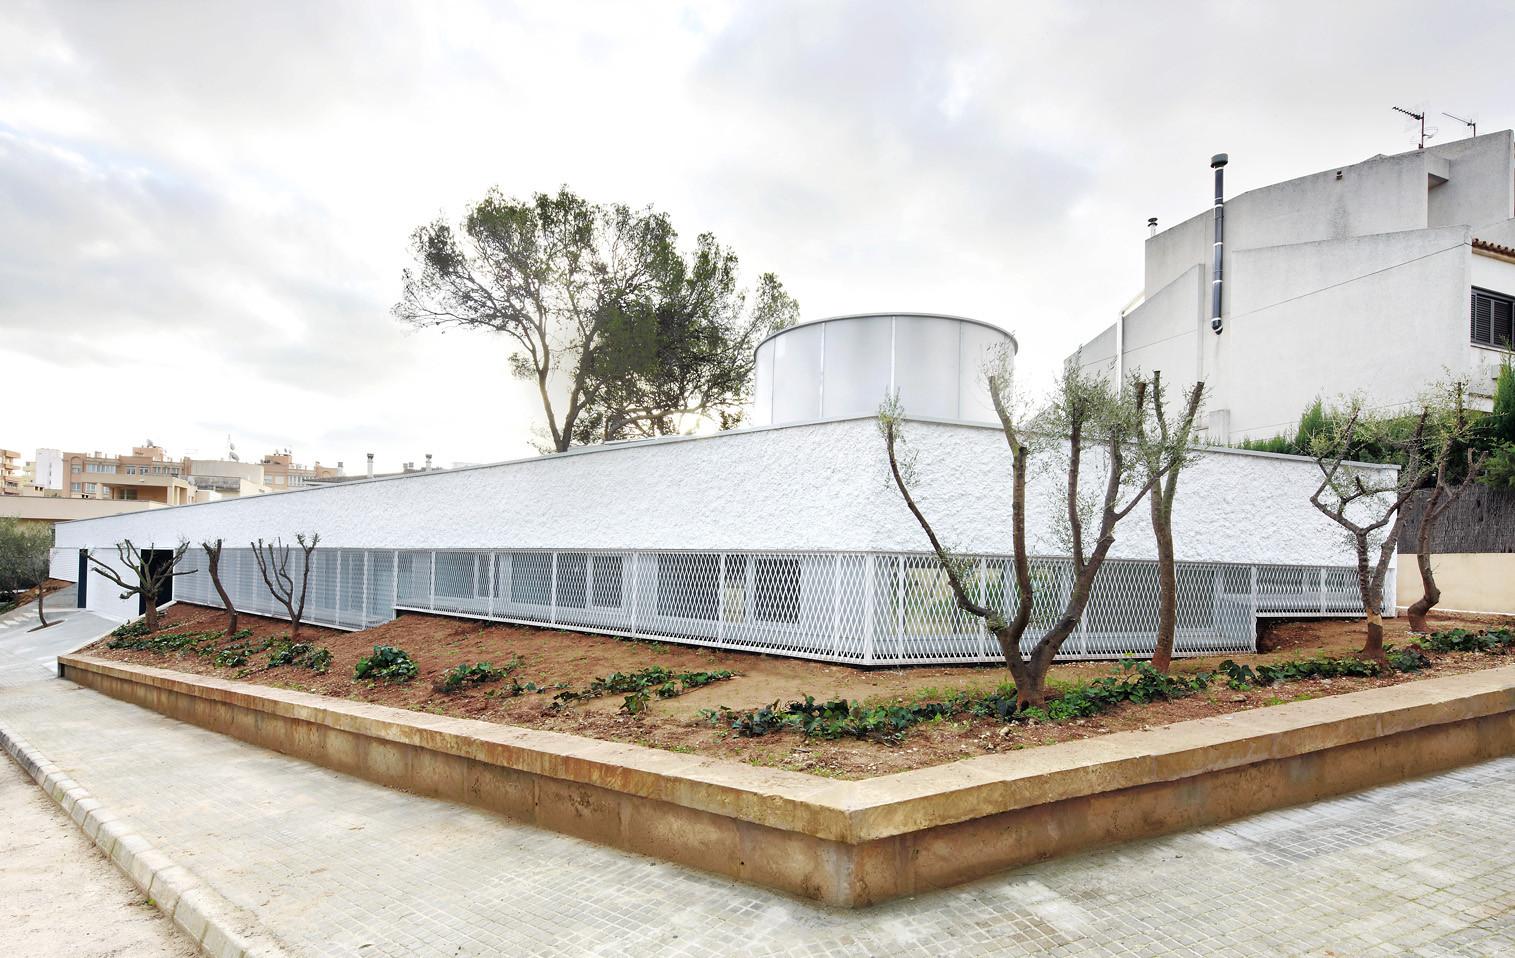 Palma de mallorca tag plataforma arquitectura - Arquitectos palma de mallorca ...